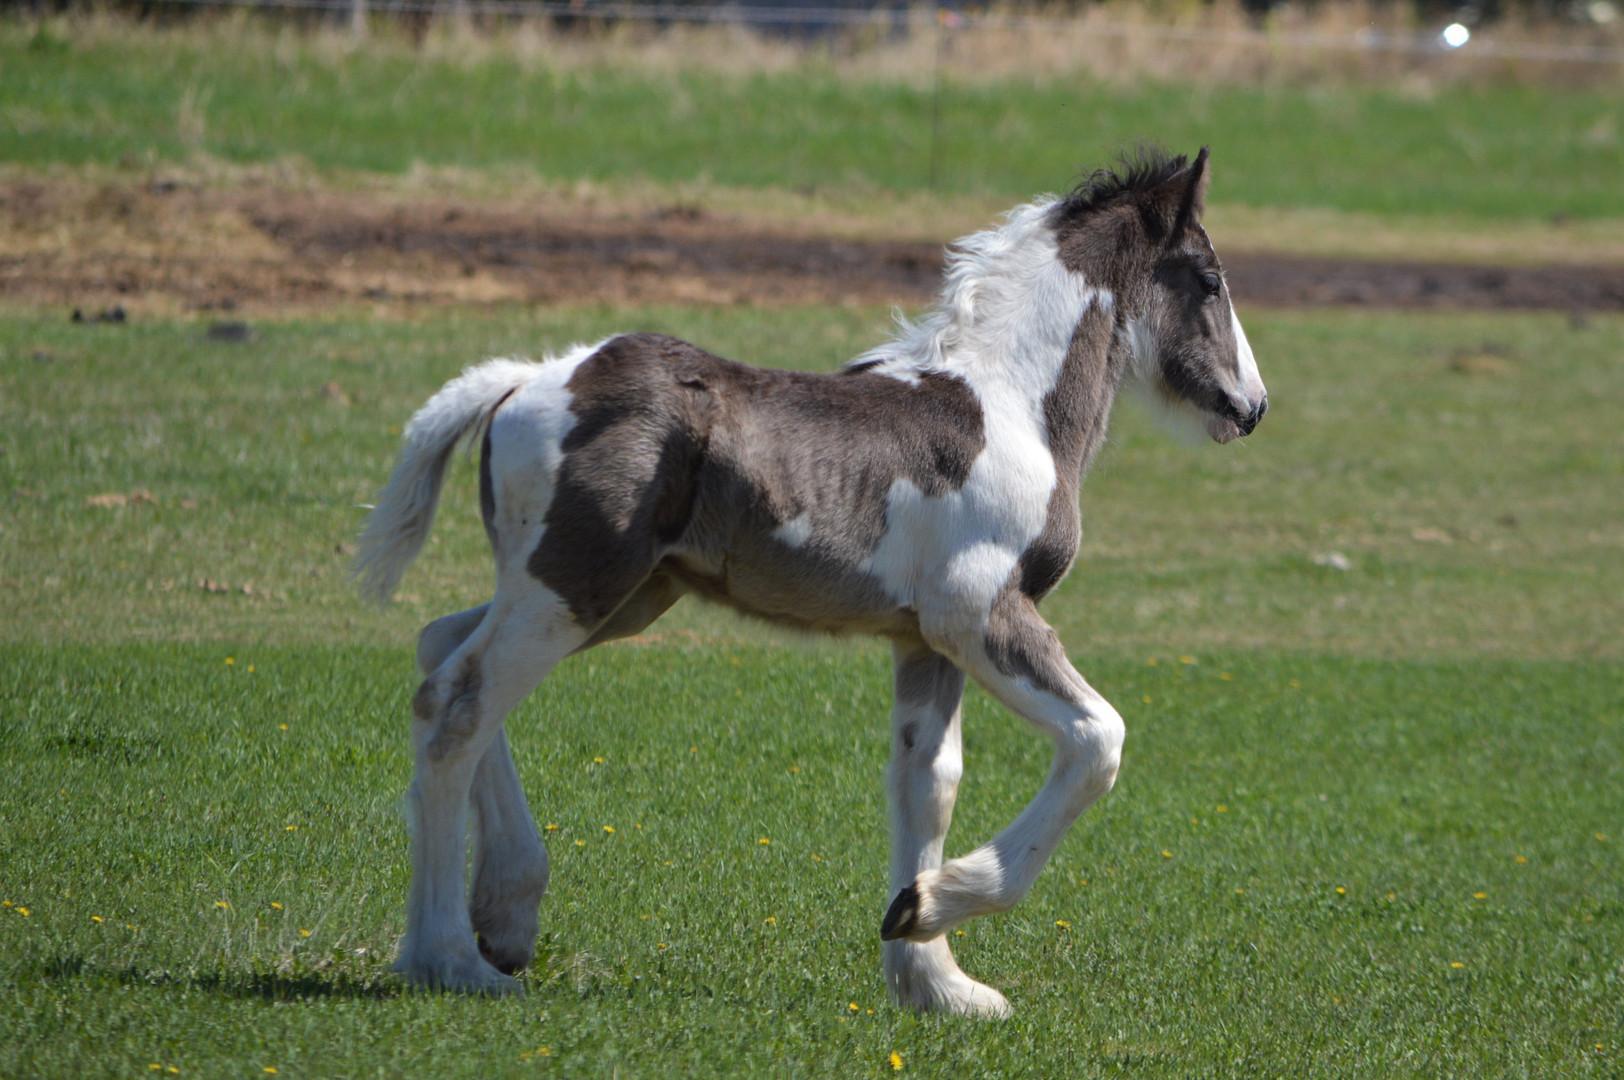 Hercules, our 2018 Drum foal